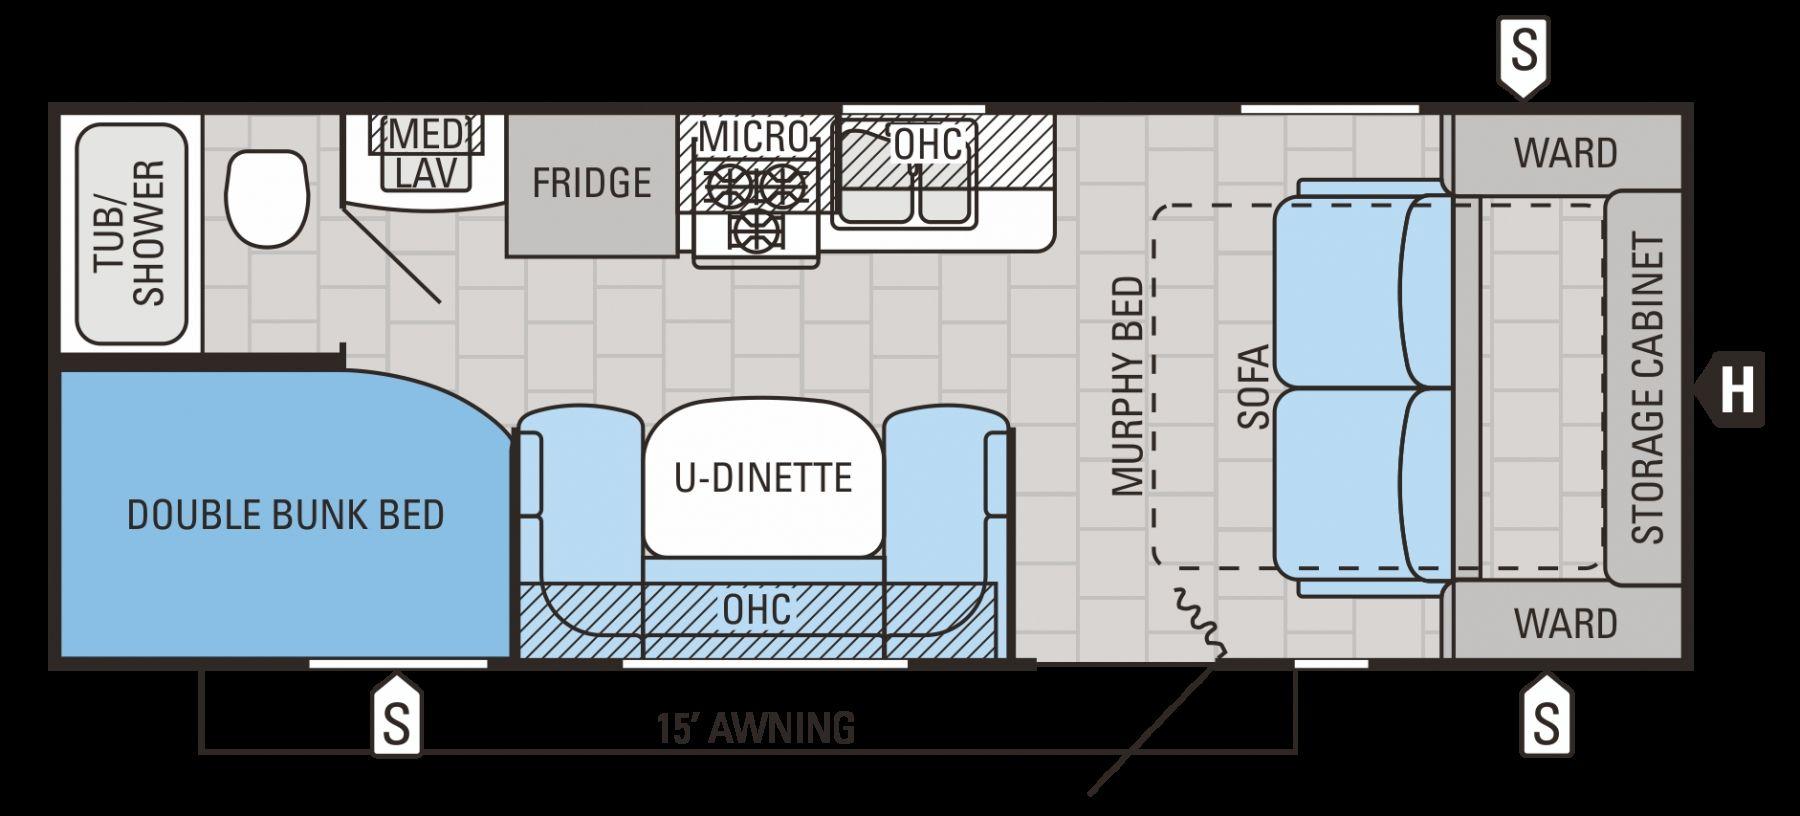 24 Foot Rv Floor Plans Travel Trailer Floor Plans Rv Floor